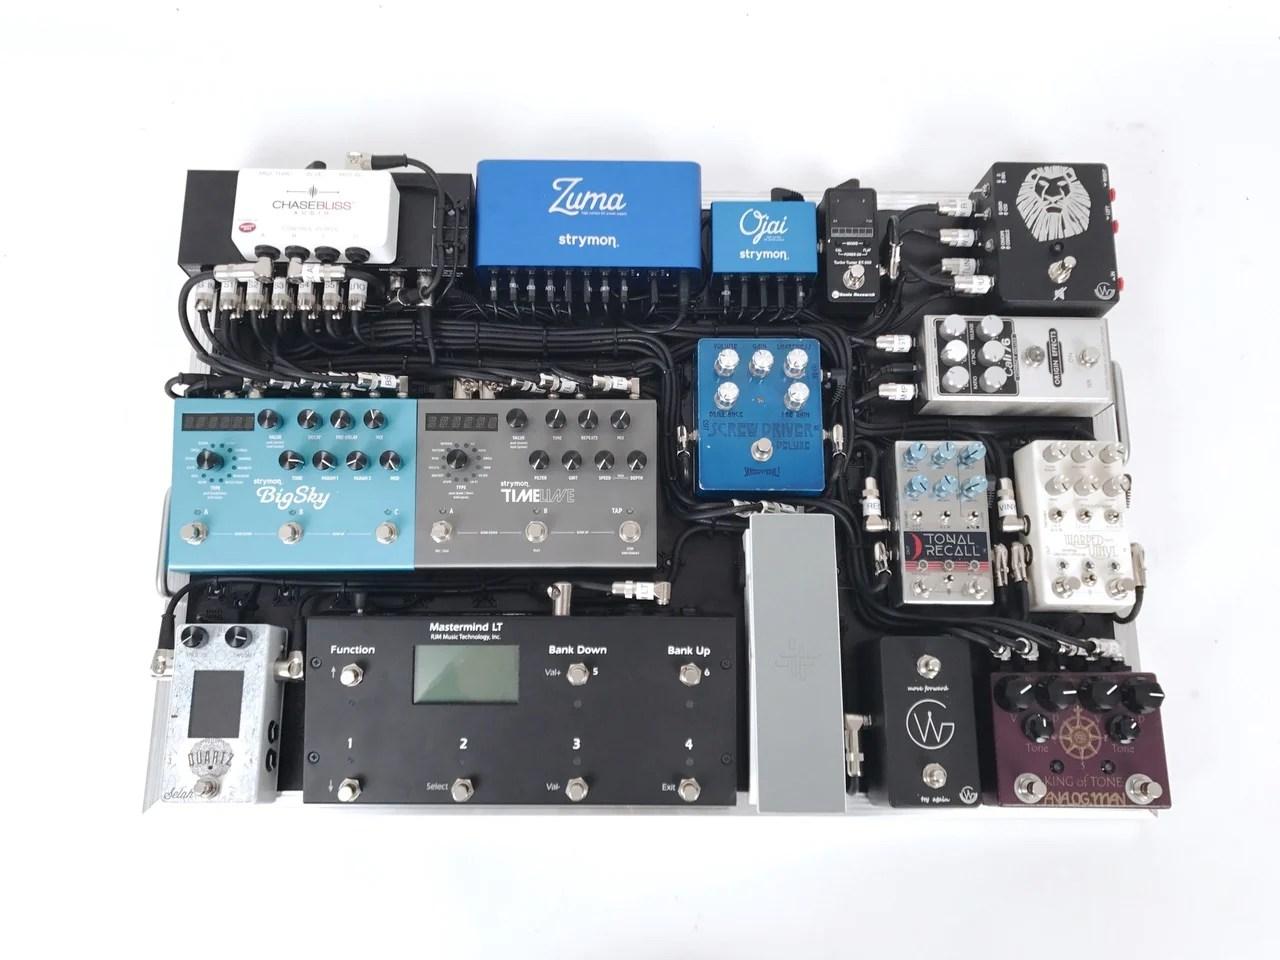 custom pedalboard wiring setup  [ 1280 x 960 Pixel ]